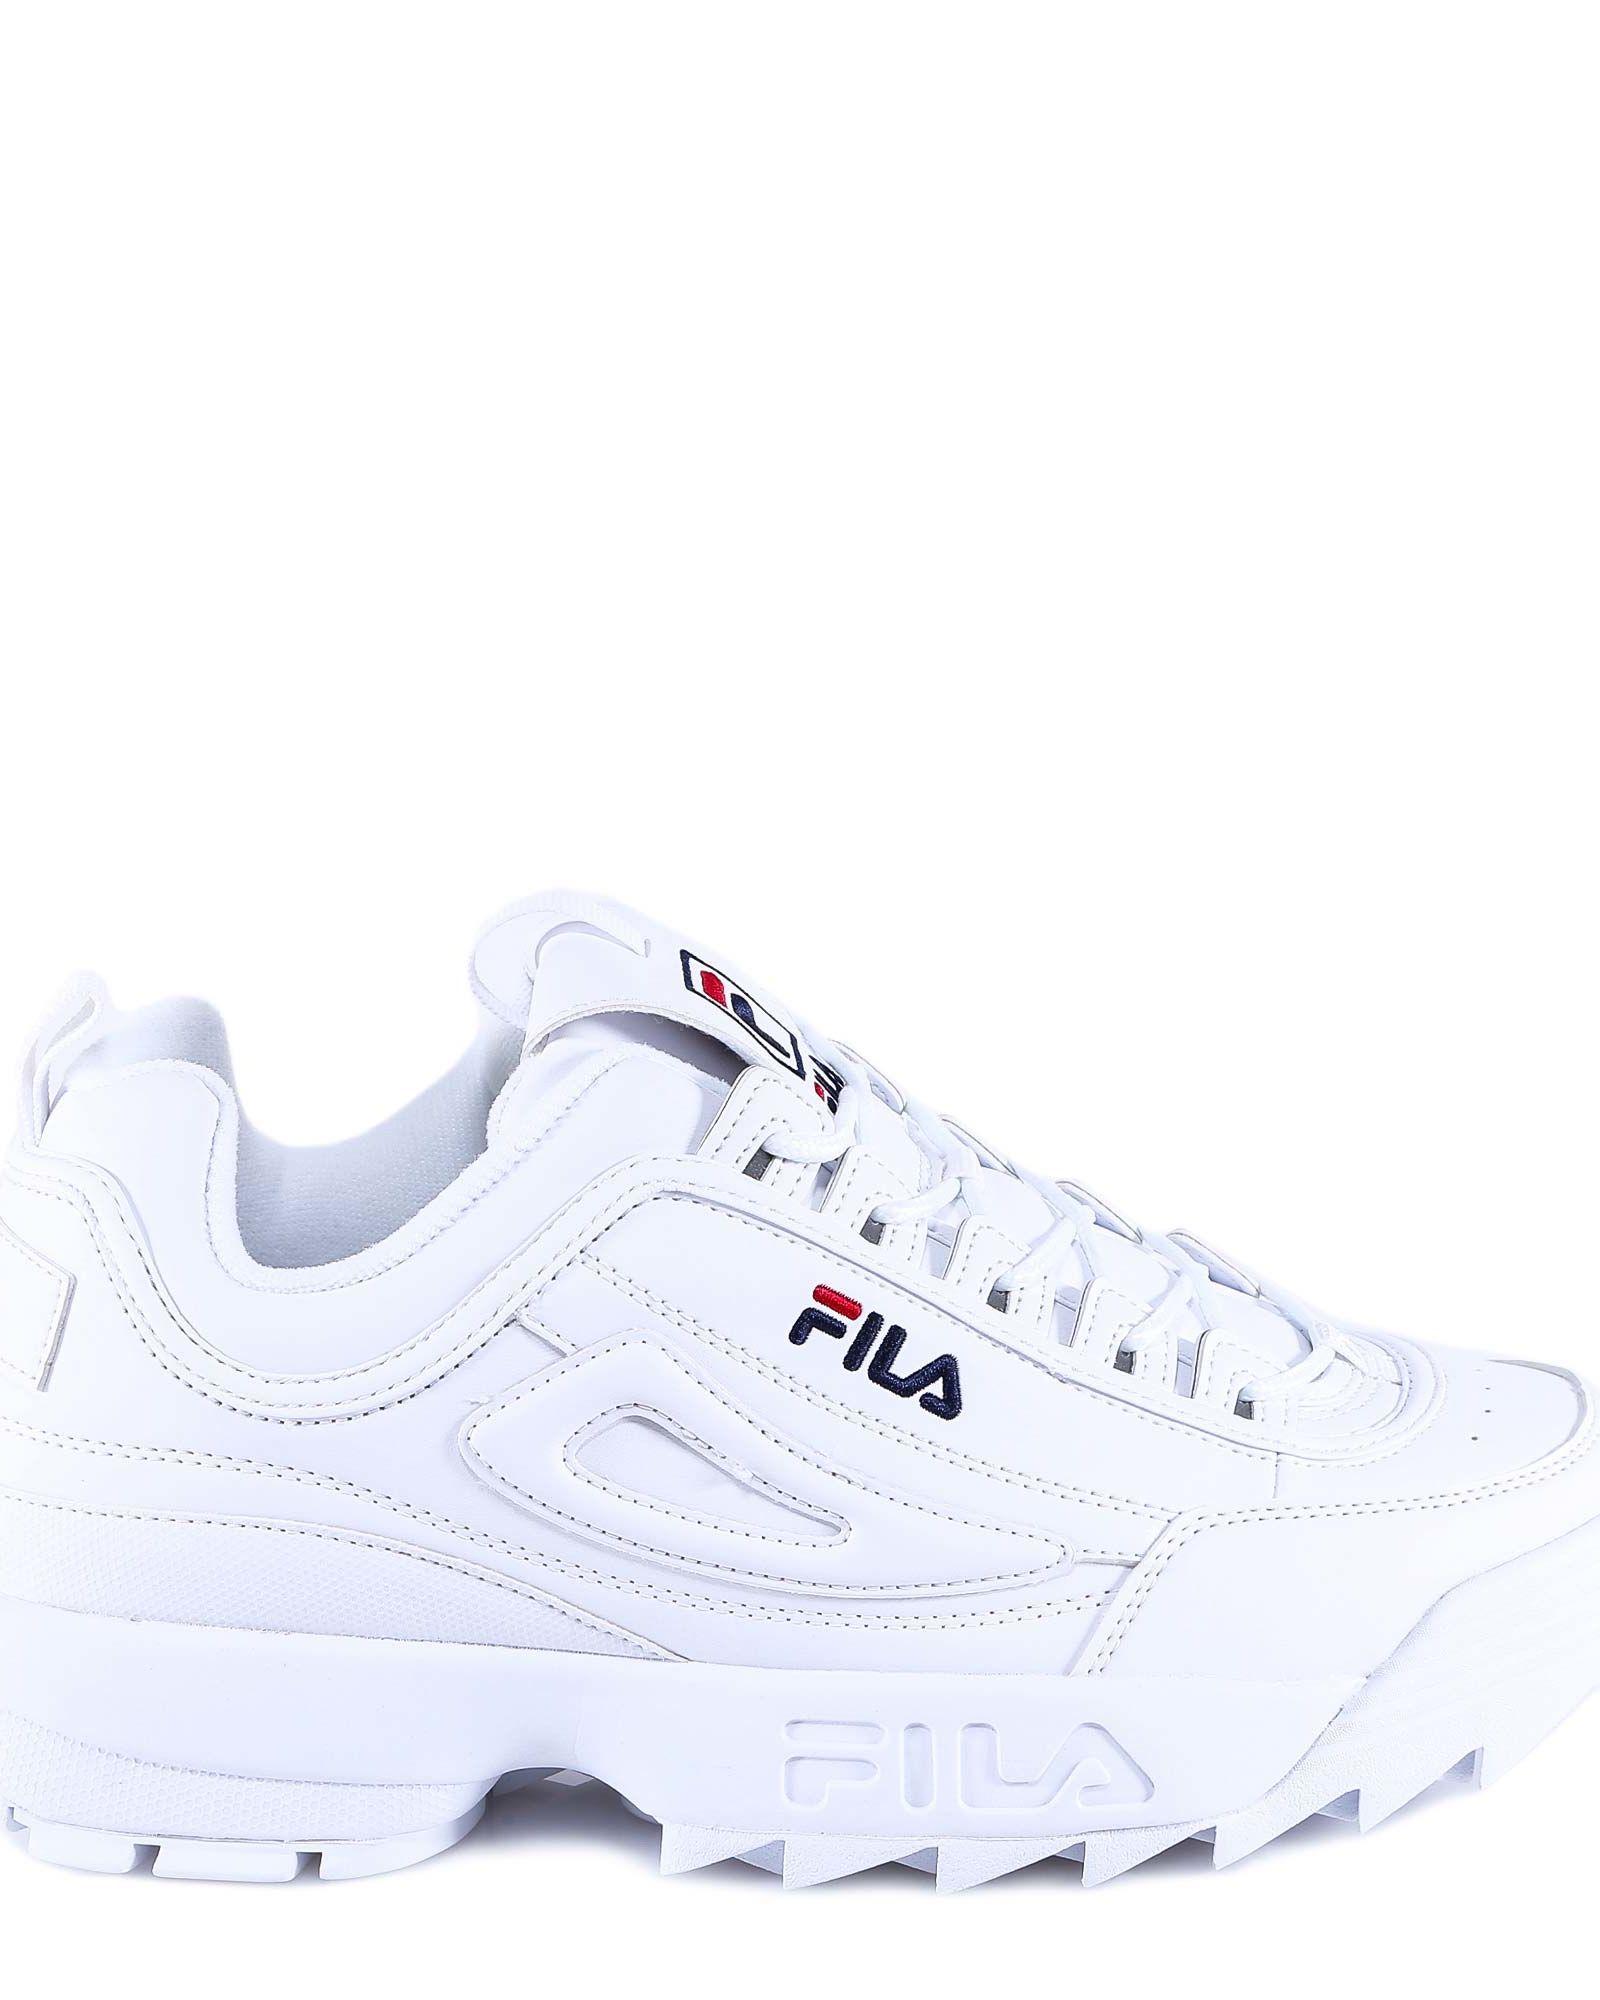 Fila Disruptor Low Men White white   FILA Official